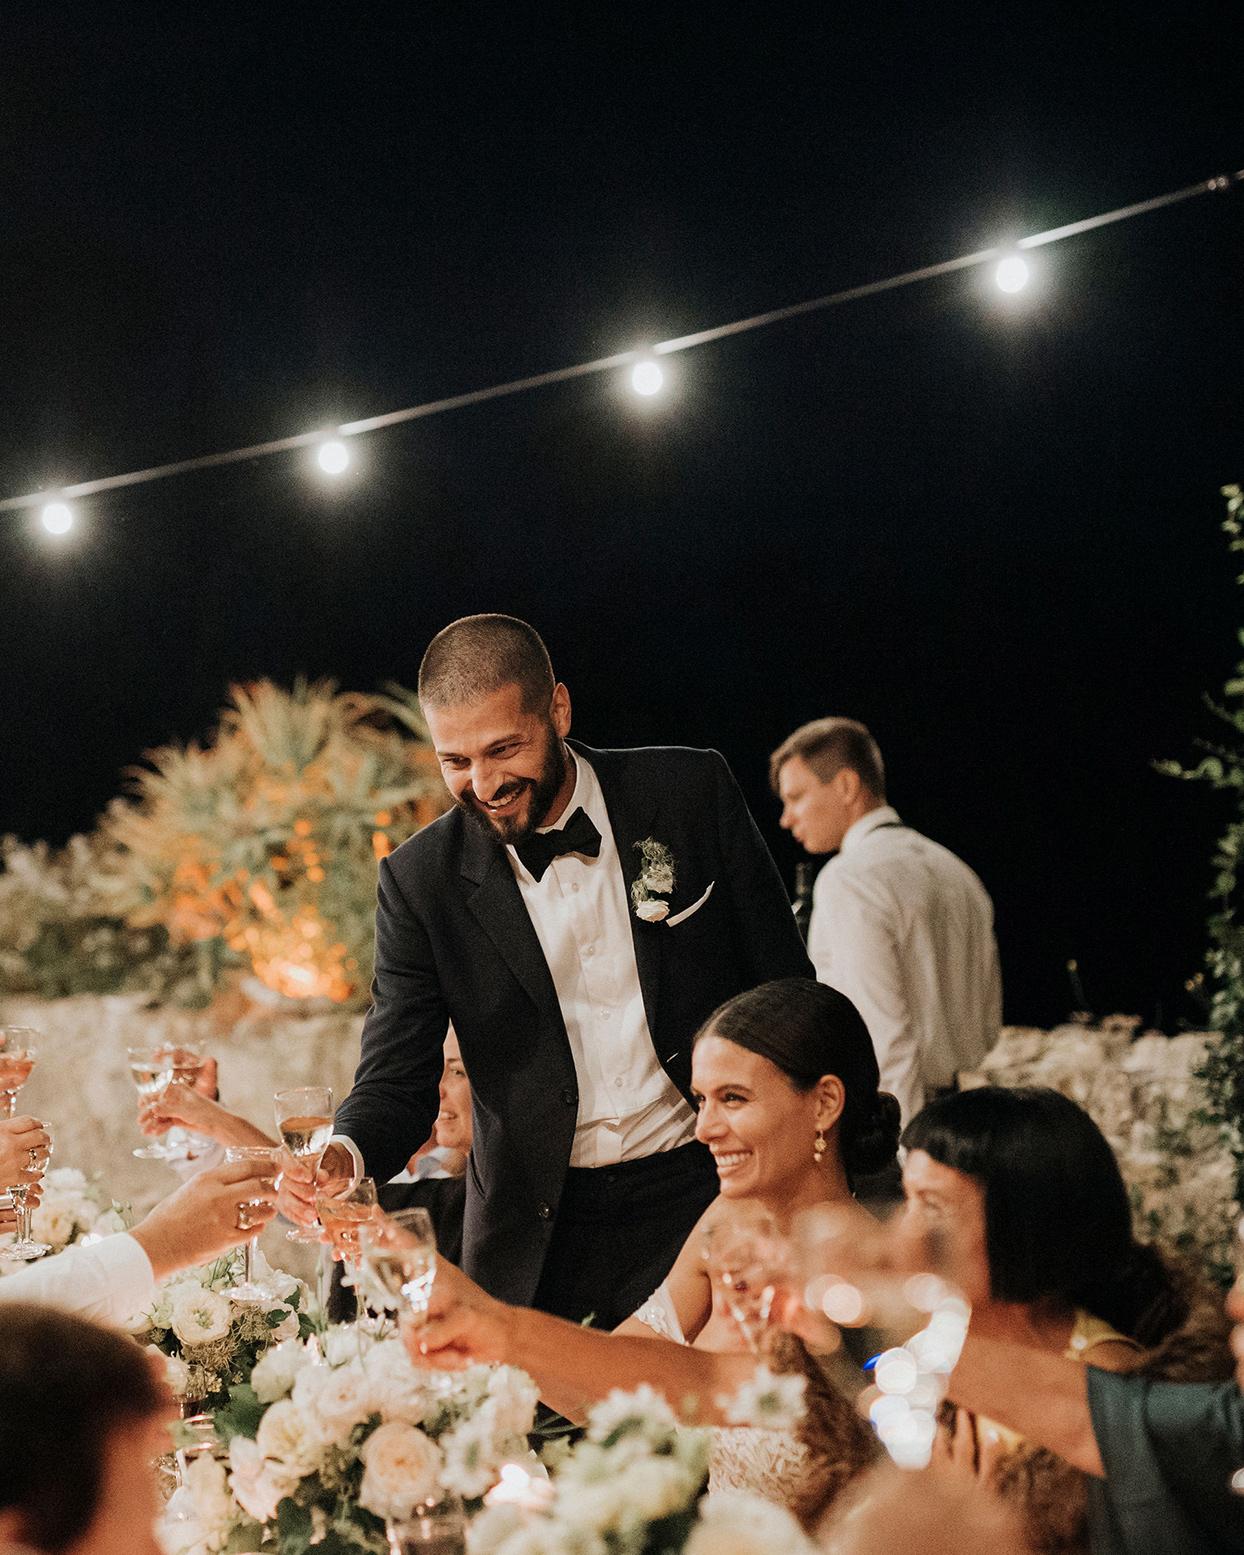 jaclyn antonio wedding bride and groom toast